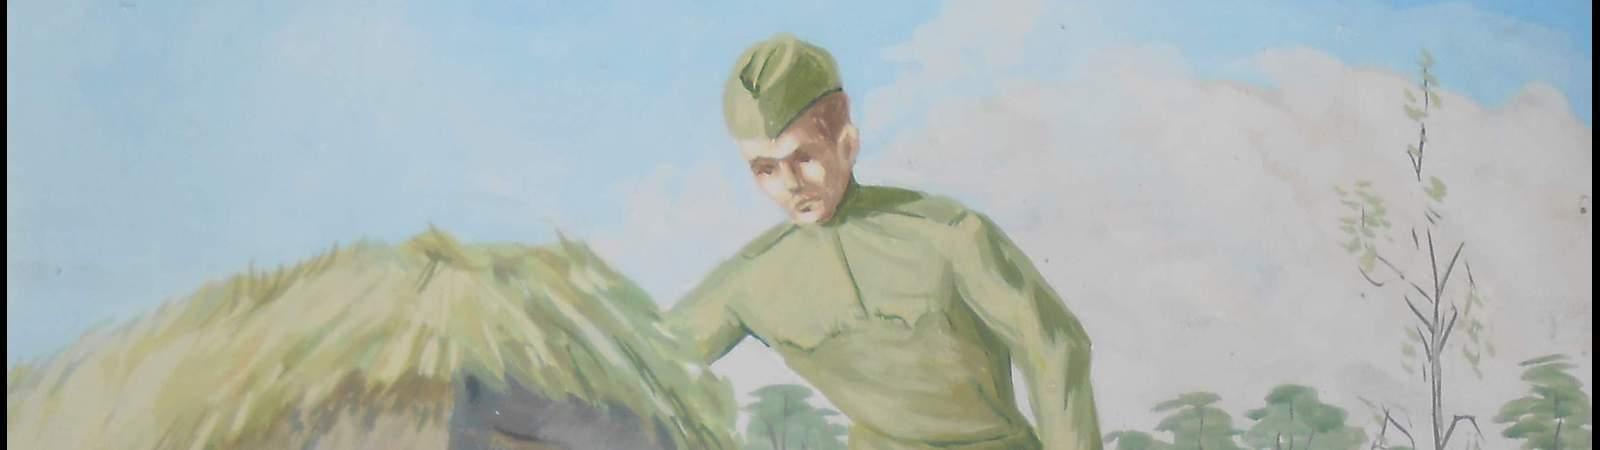 Абызов Михаил Петрович. Кемерово